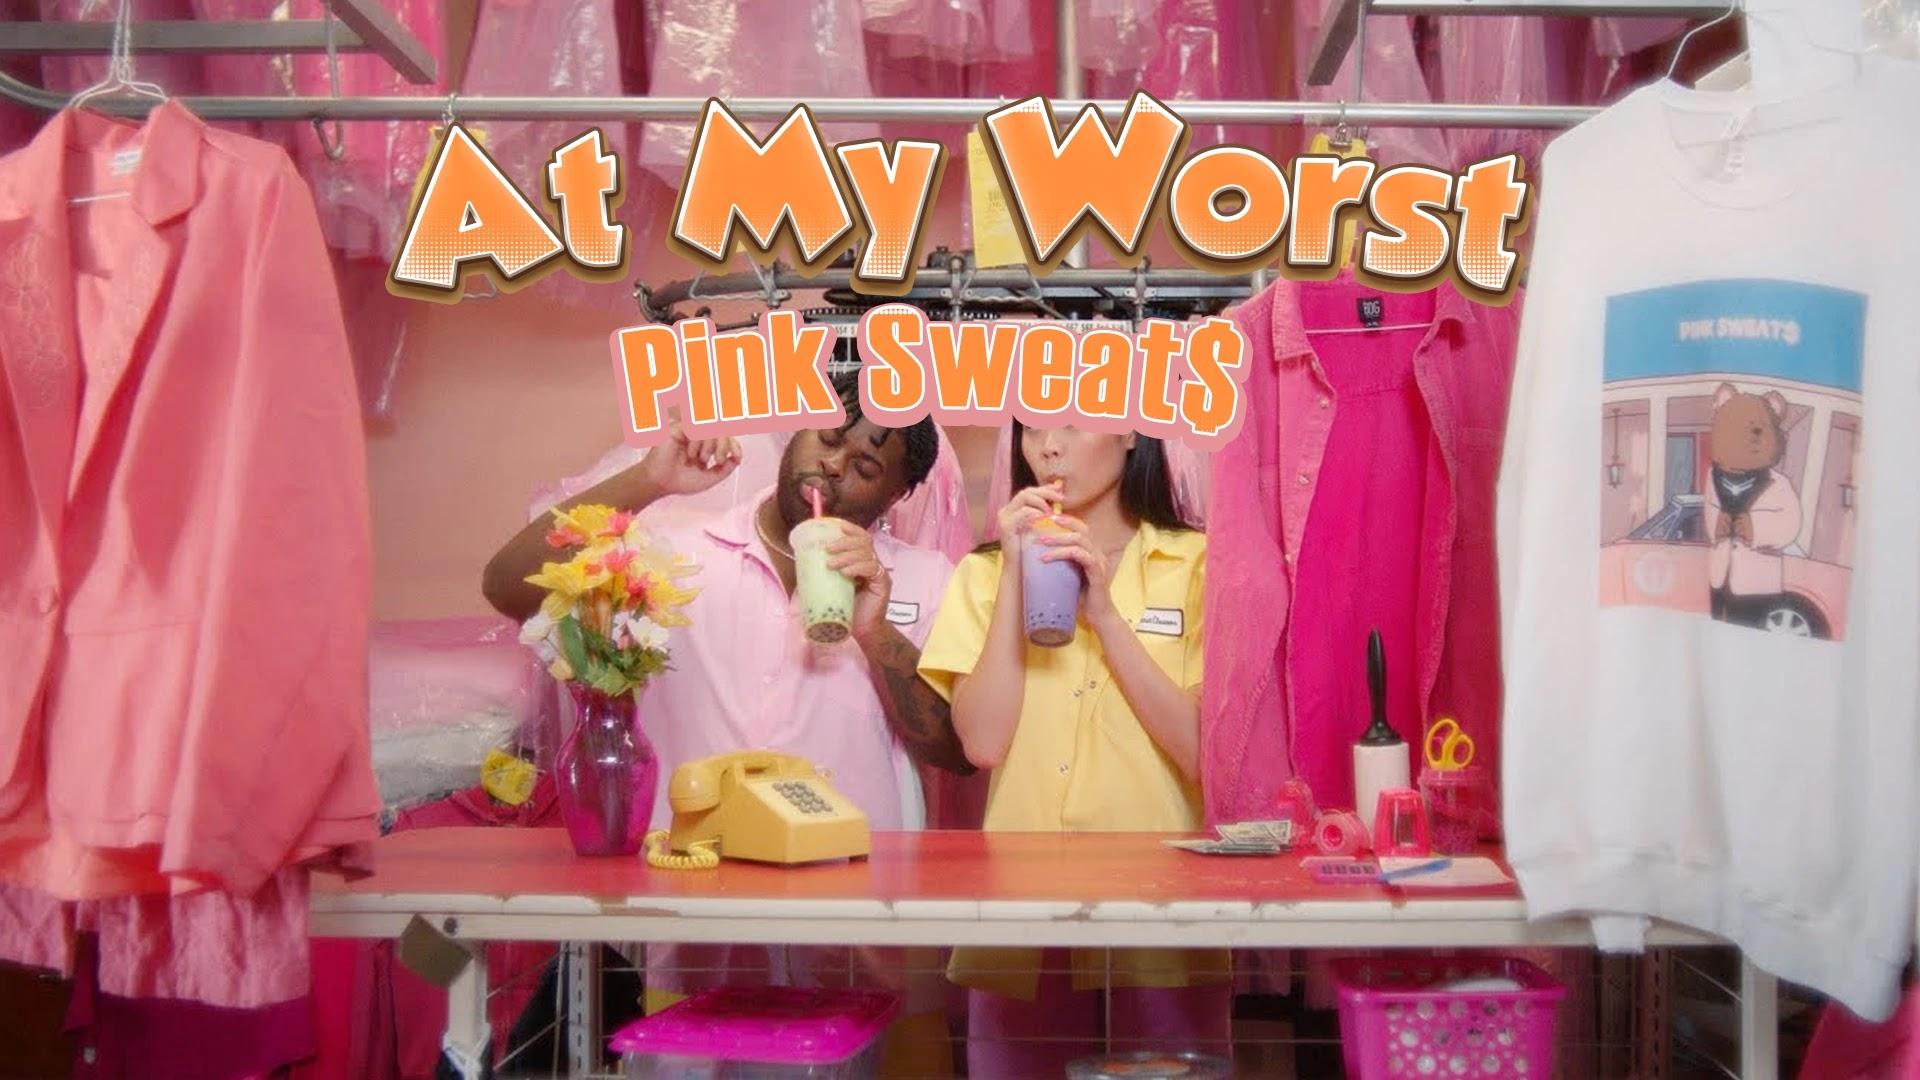 At My Worst - Pink Sweat$